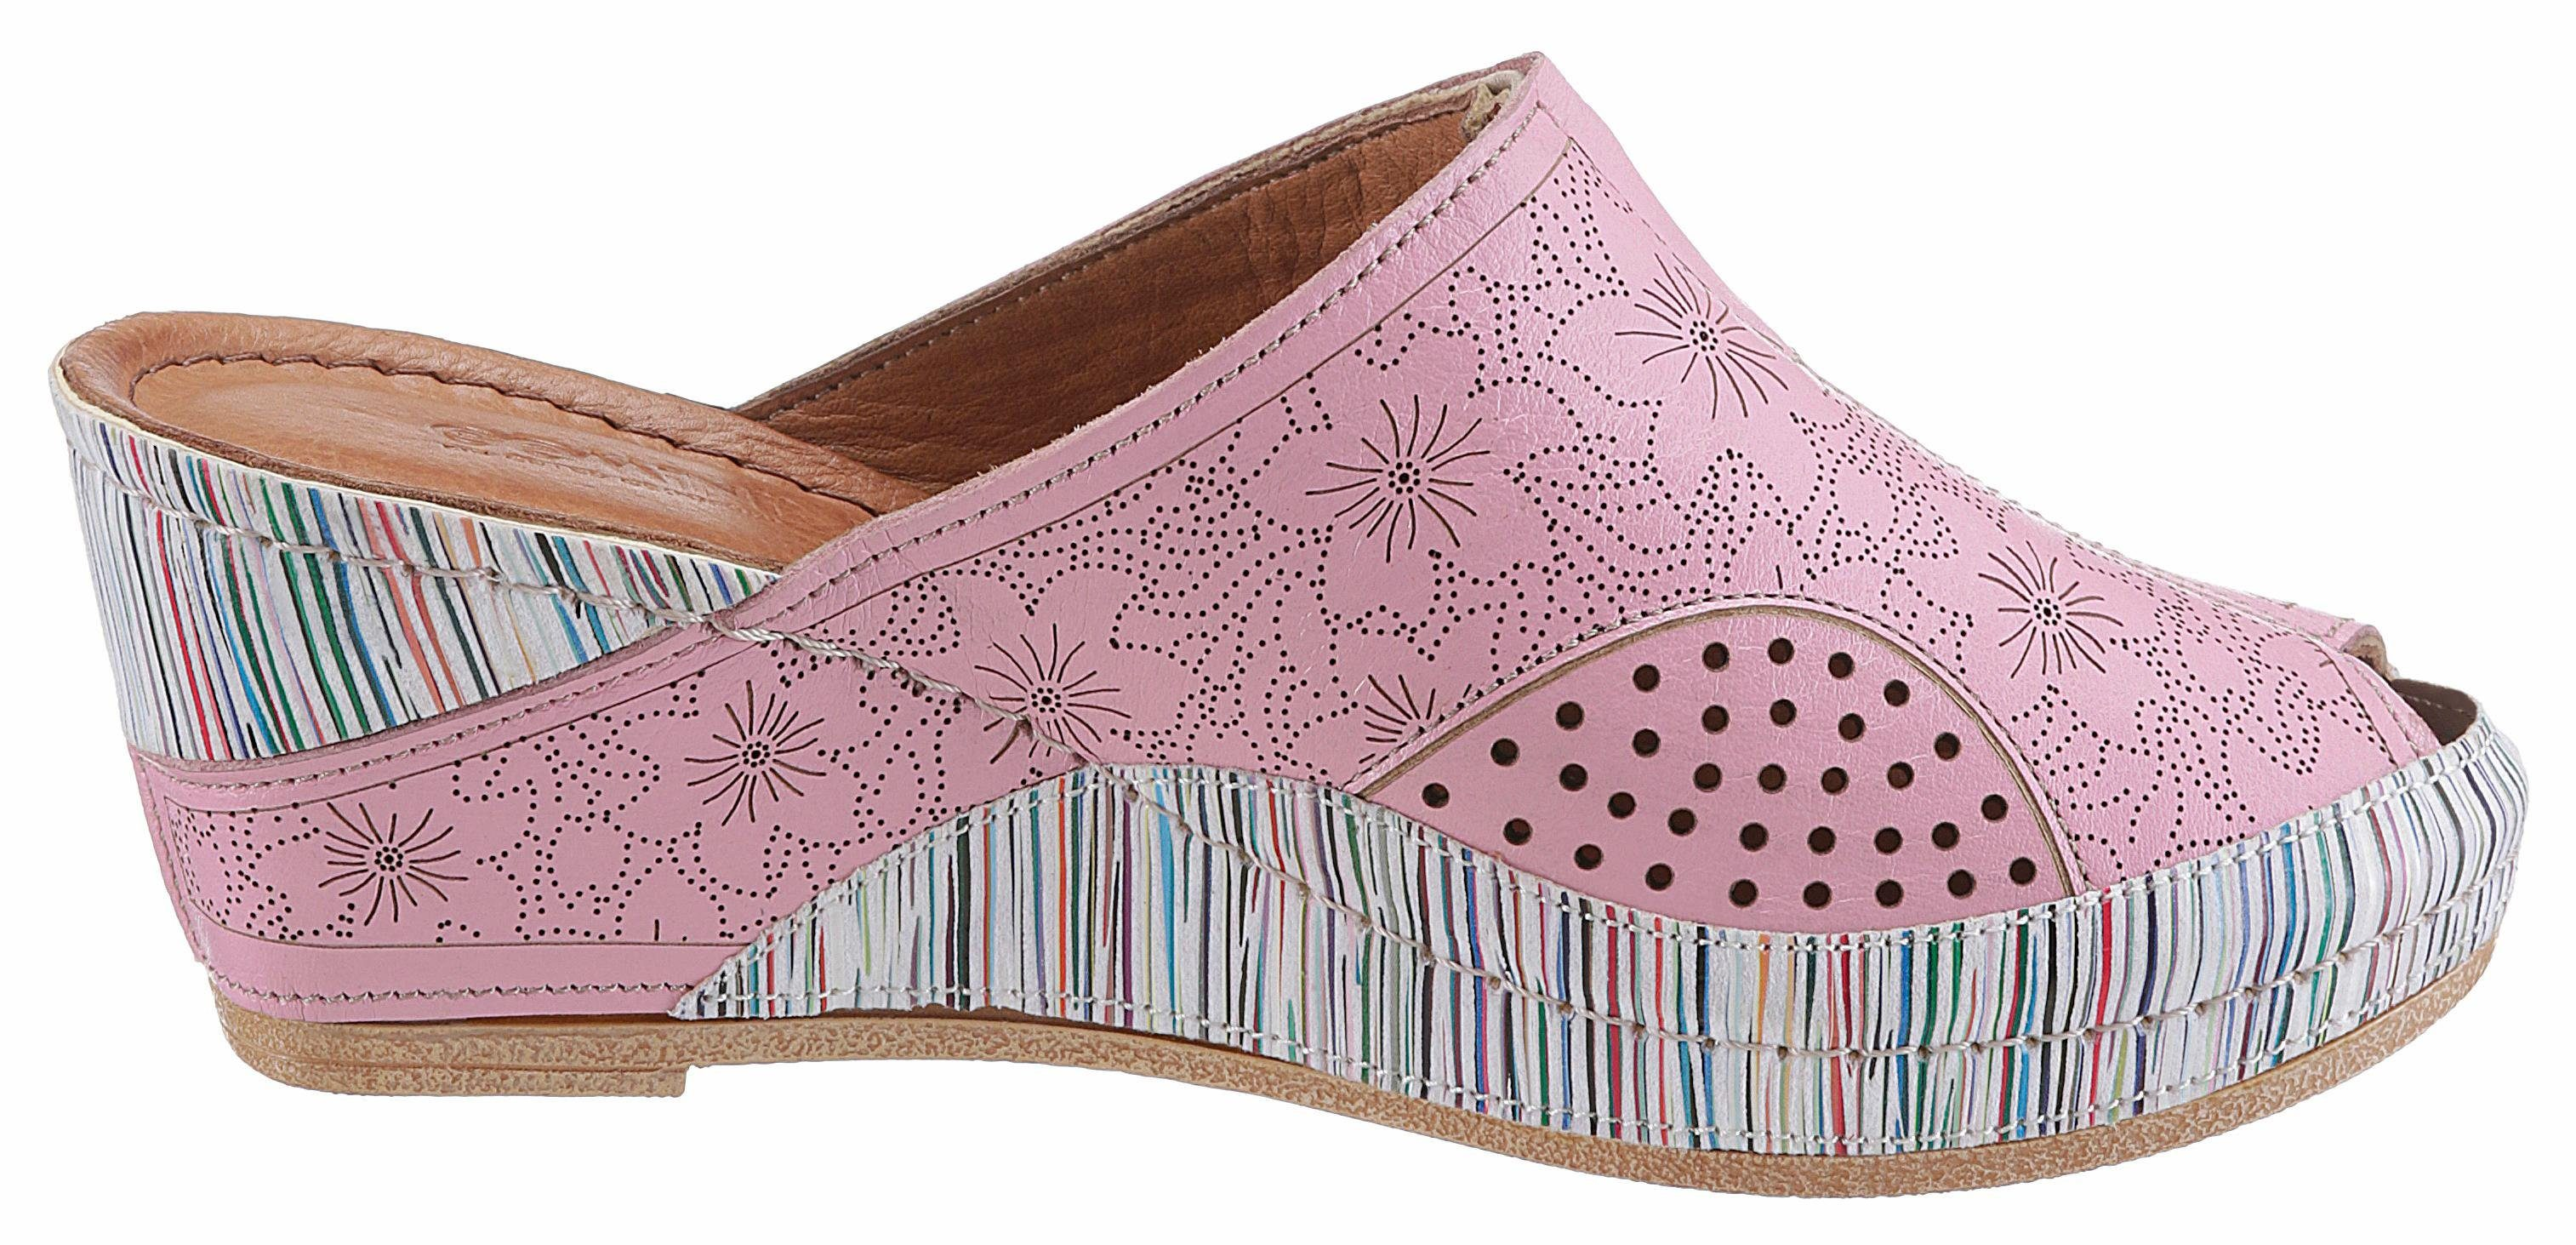 Gemini Clog, Lasercut mit Blüten online kaufen  rosa-bunt